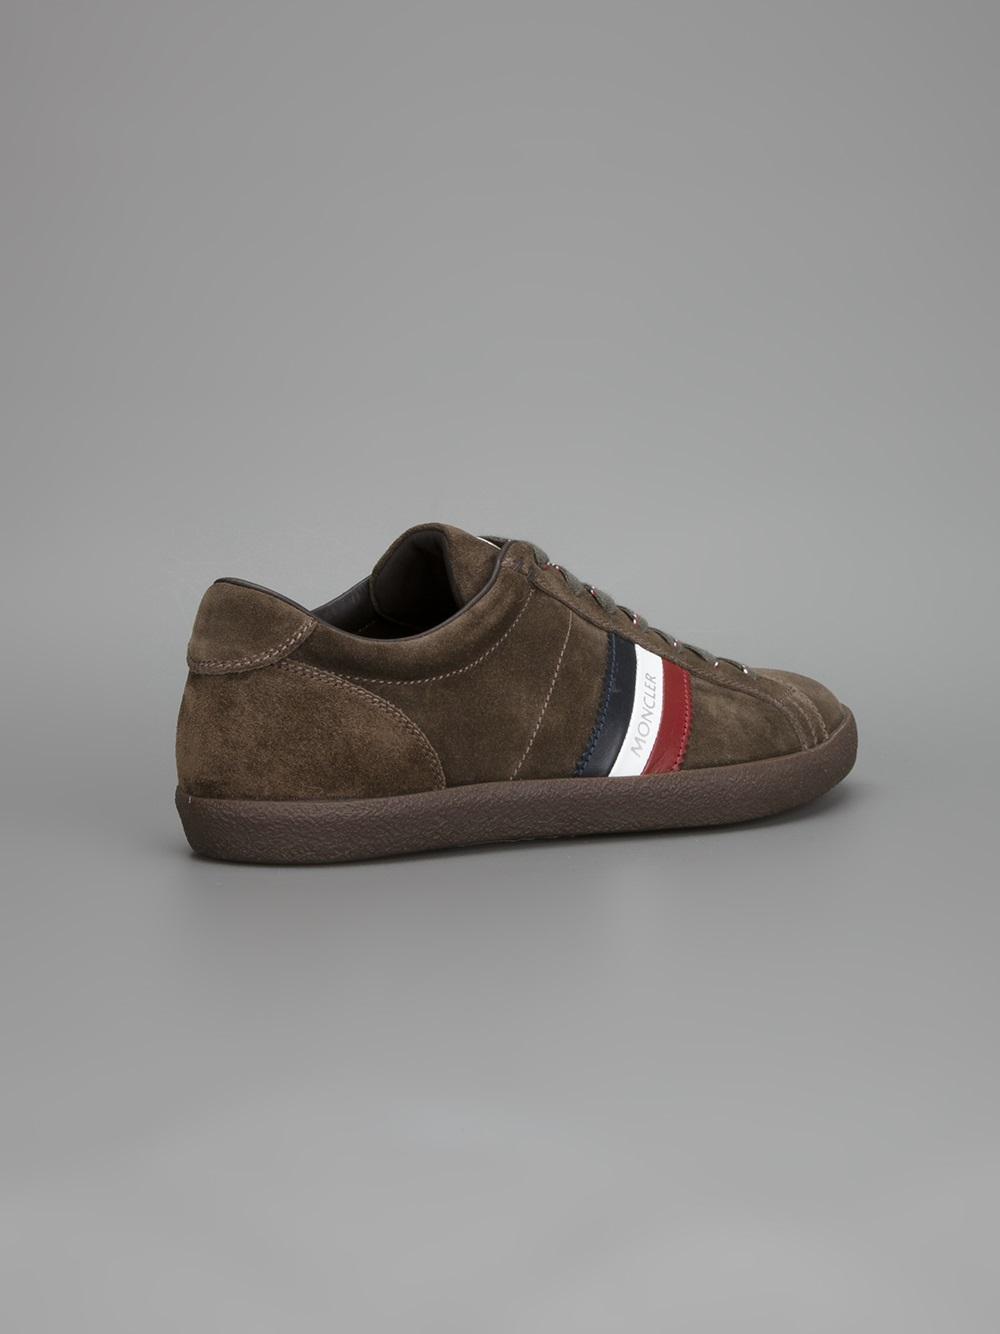 Moncler Monaco Sneaker in Brown for Men